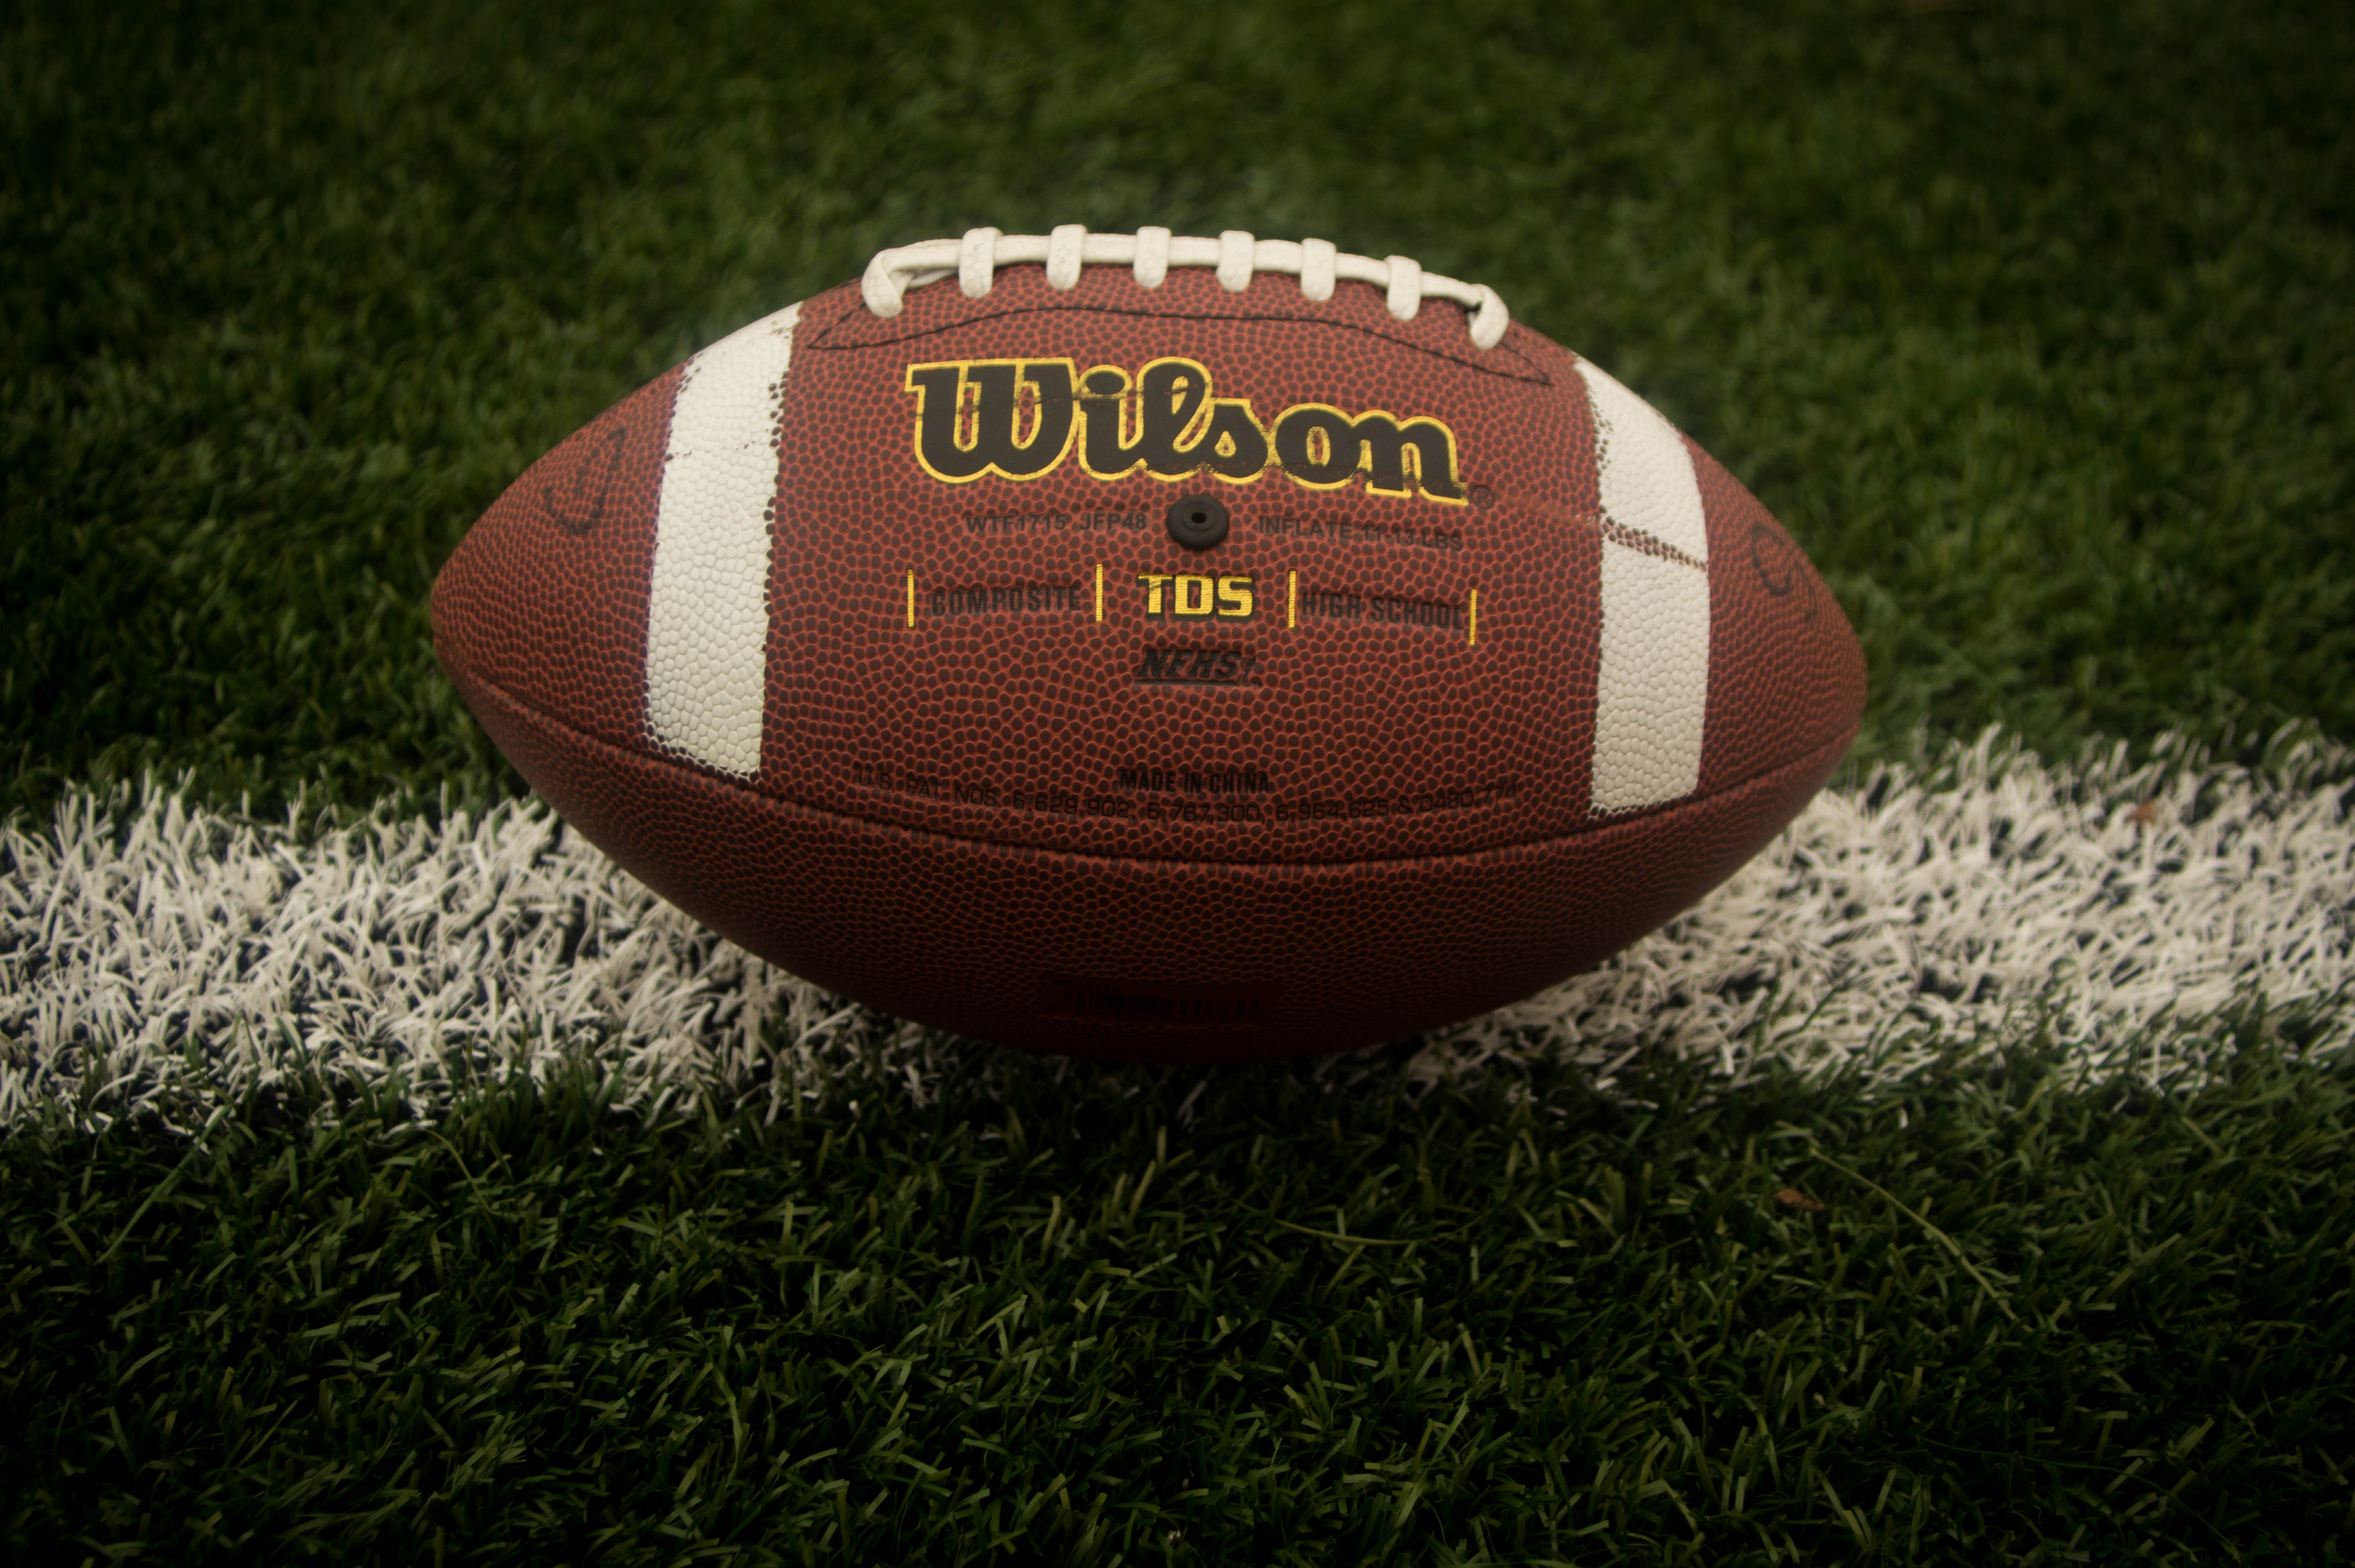 field-sport-ball-america (1)